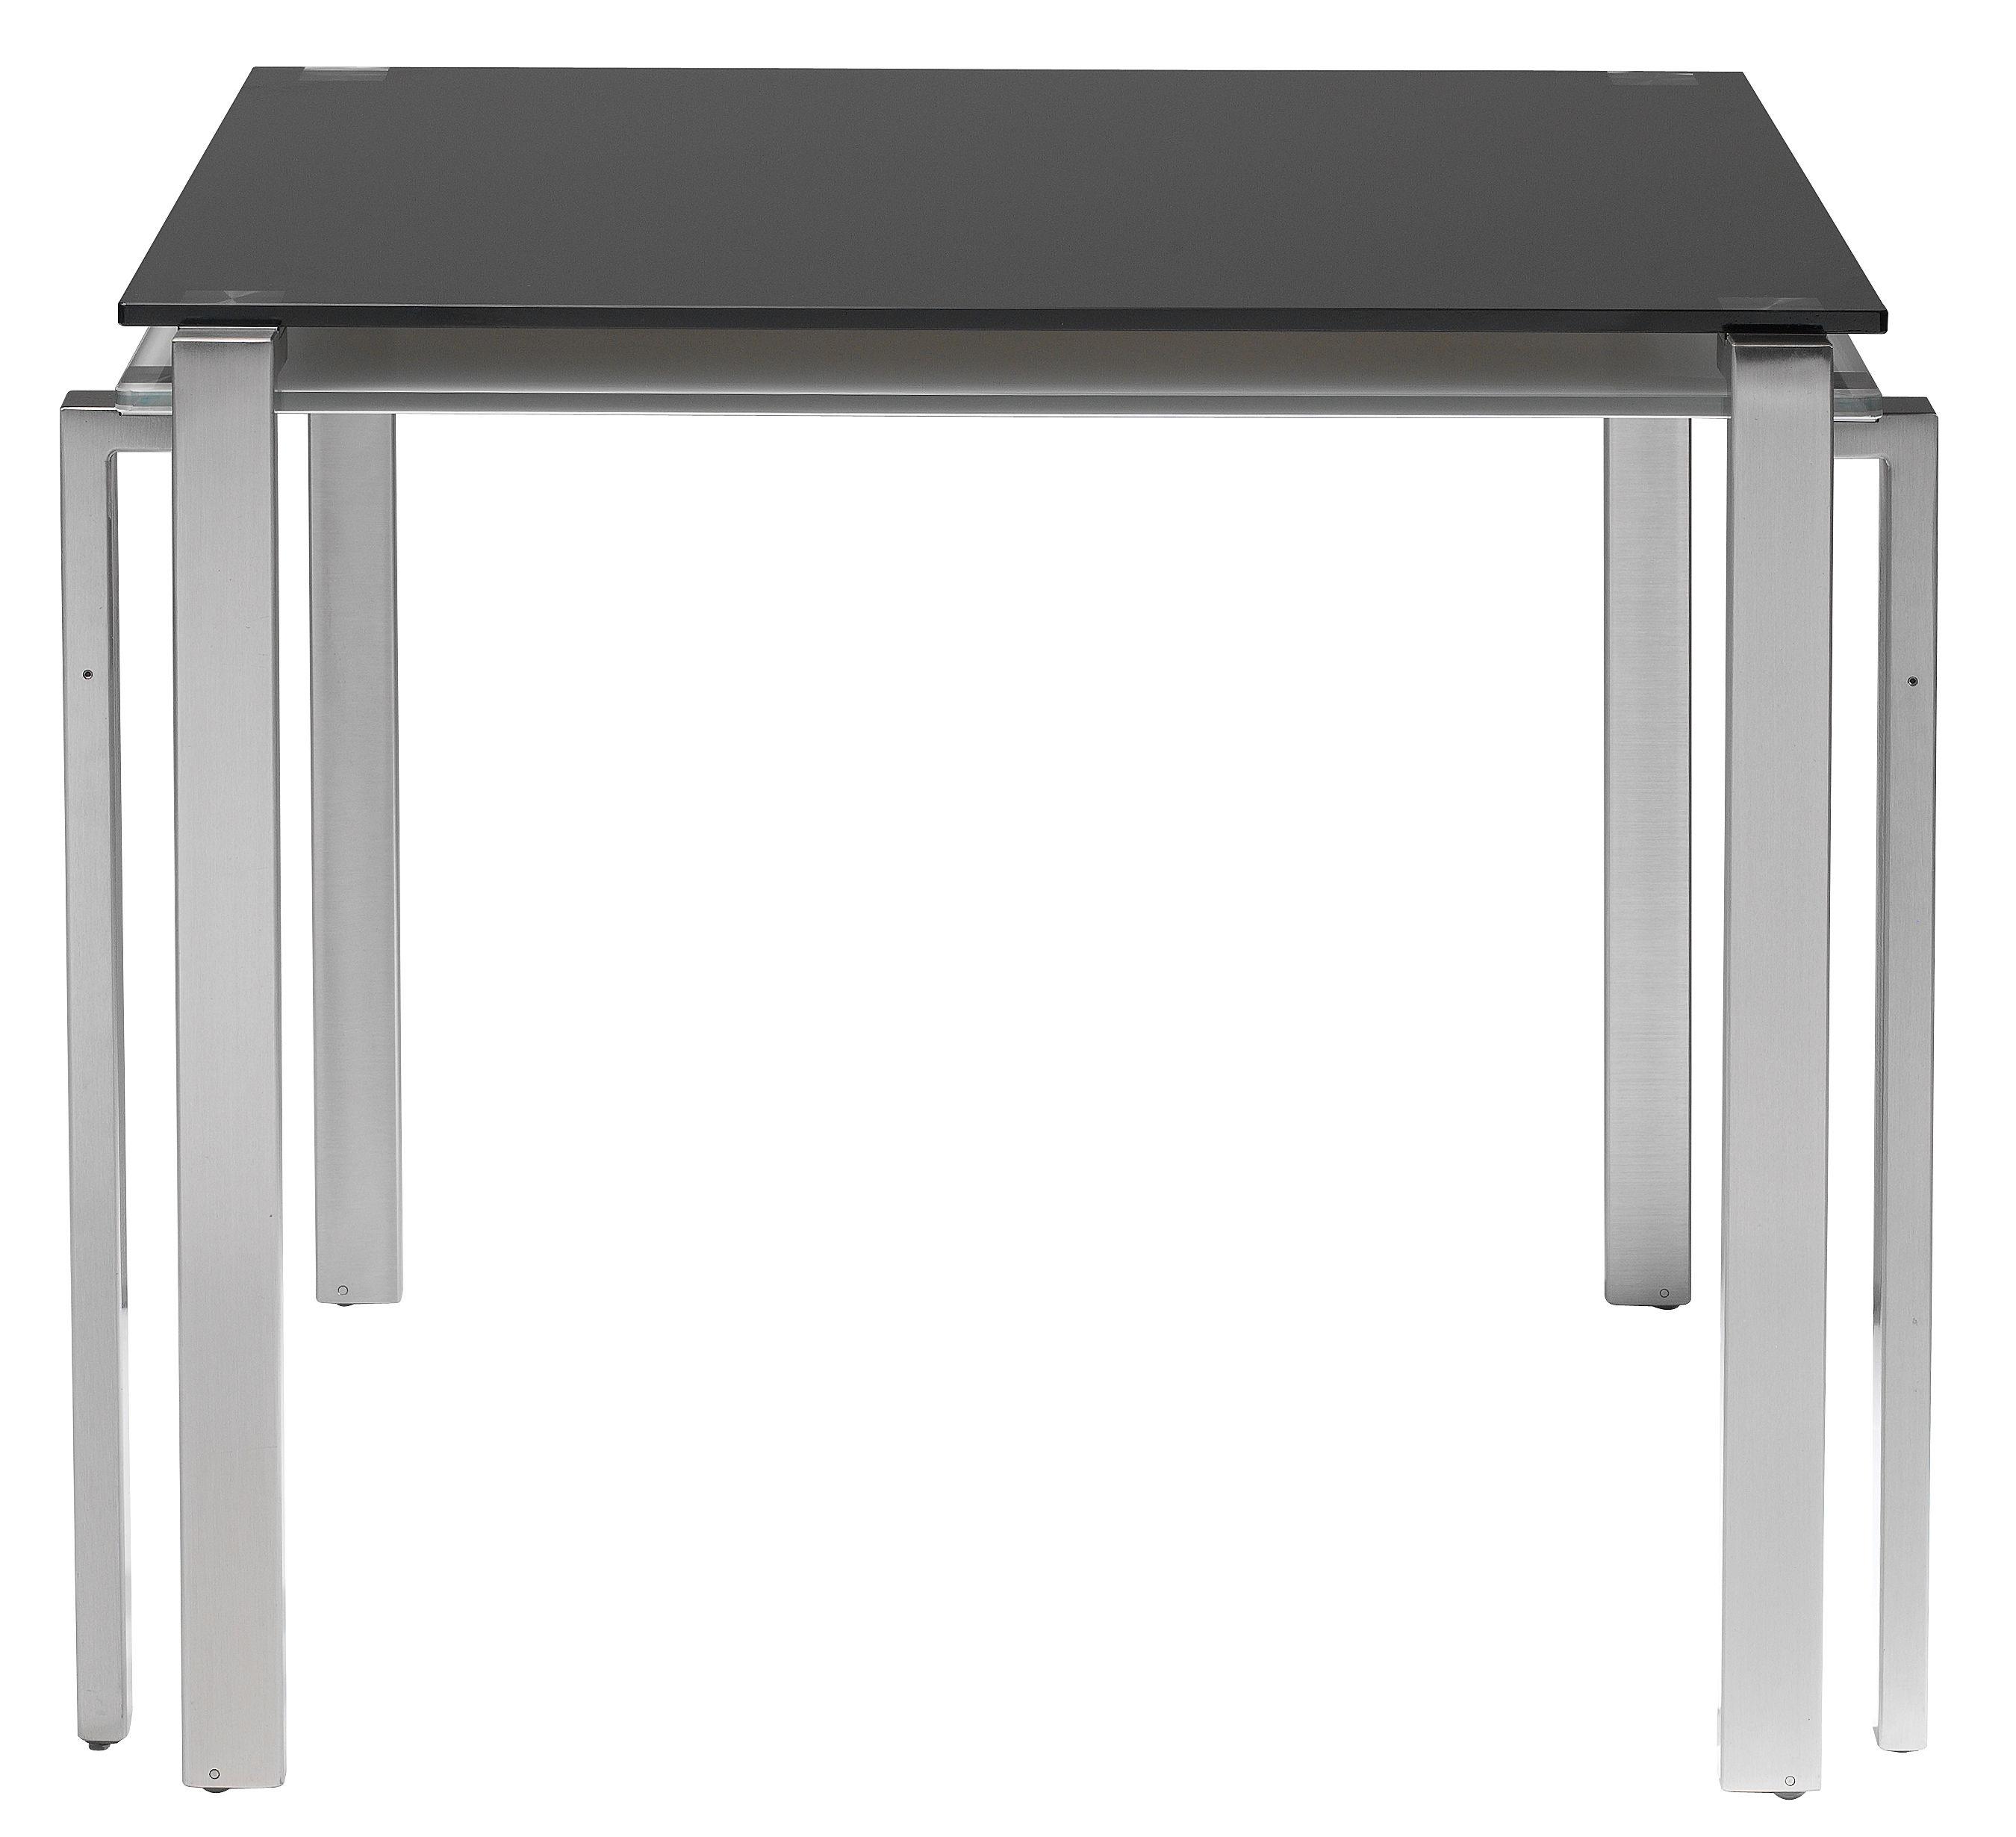 table rallonge 1 2 set 2 tables empilables carr es. Black Bedroom Furniture Sets. Home Design Ideas